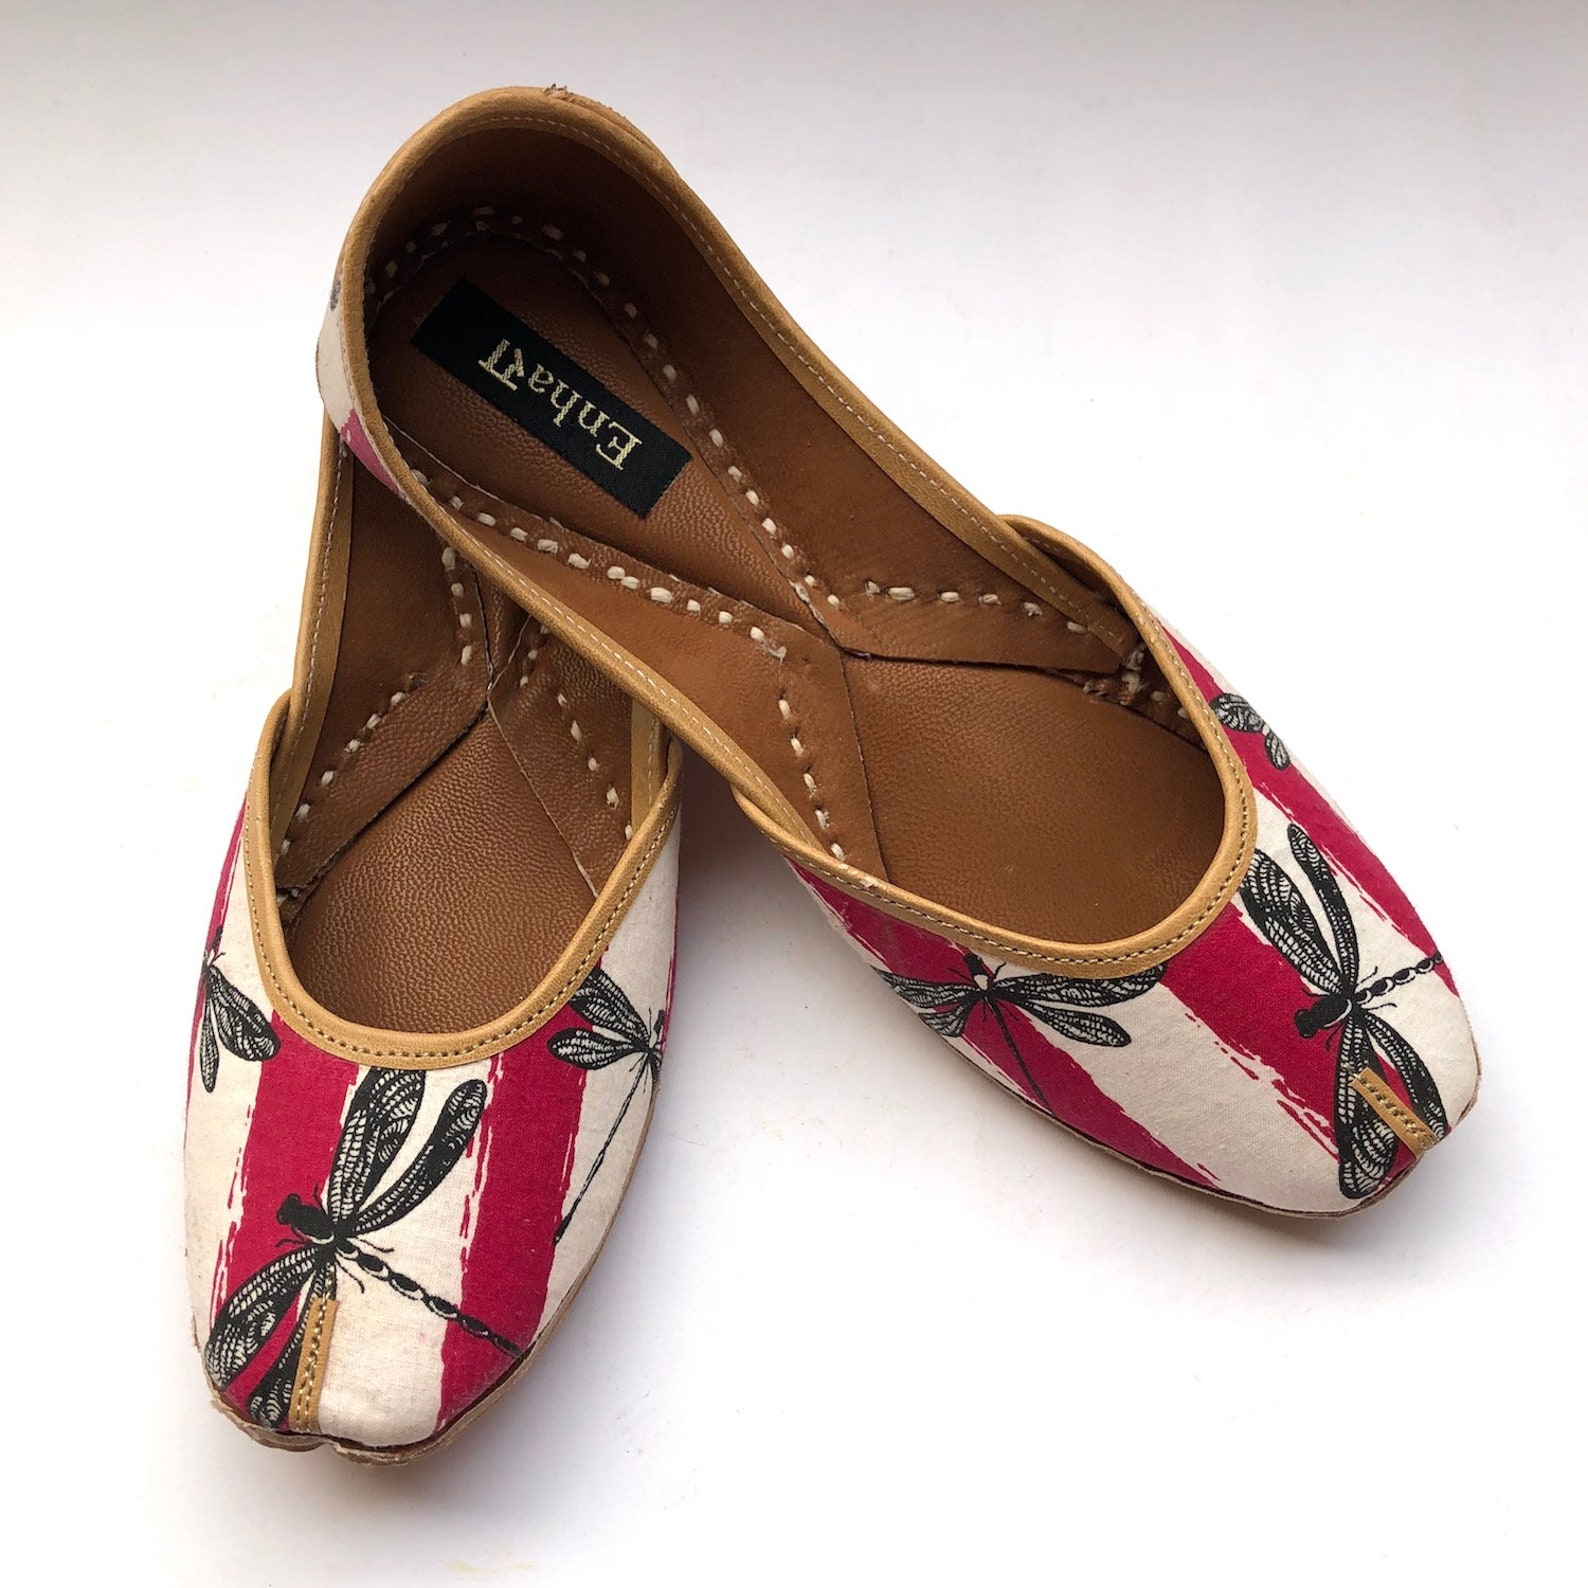 dragon fly boho white & maroon shoes for women, flat slip on shoes, indian shoes, ballet shoes, handmade designer shoes/juttis o